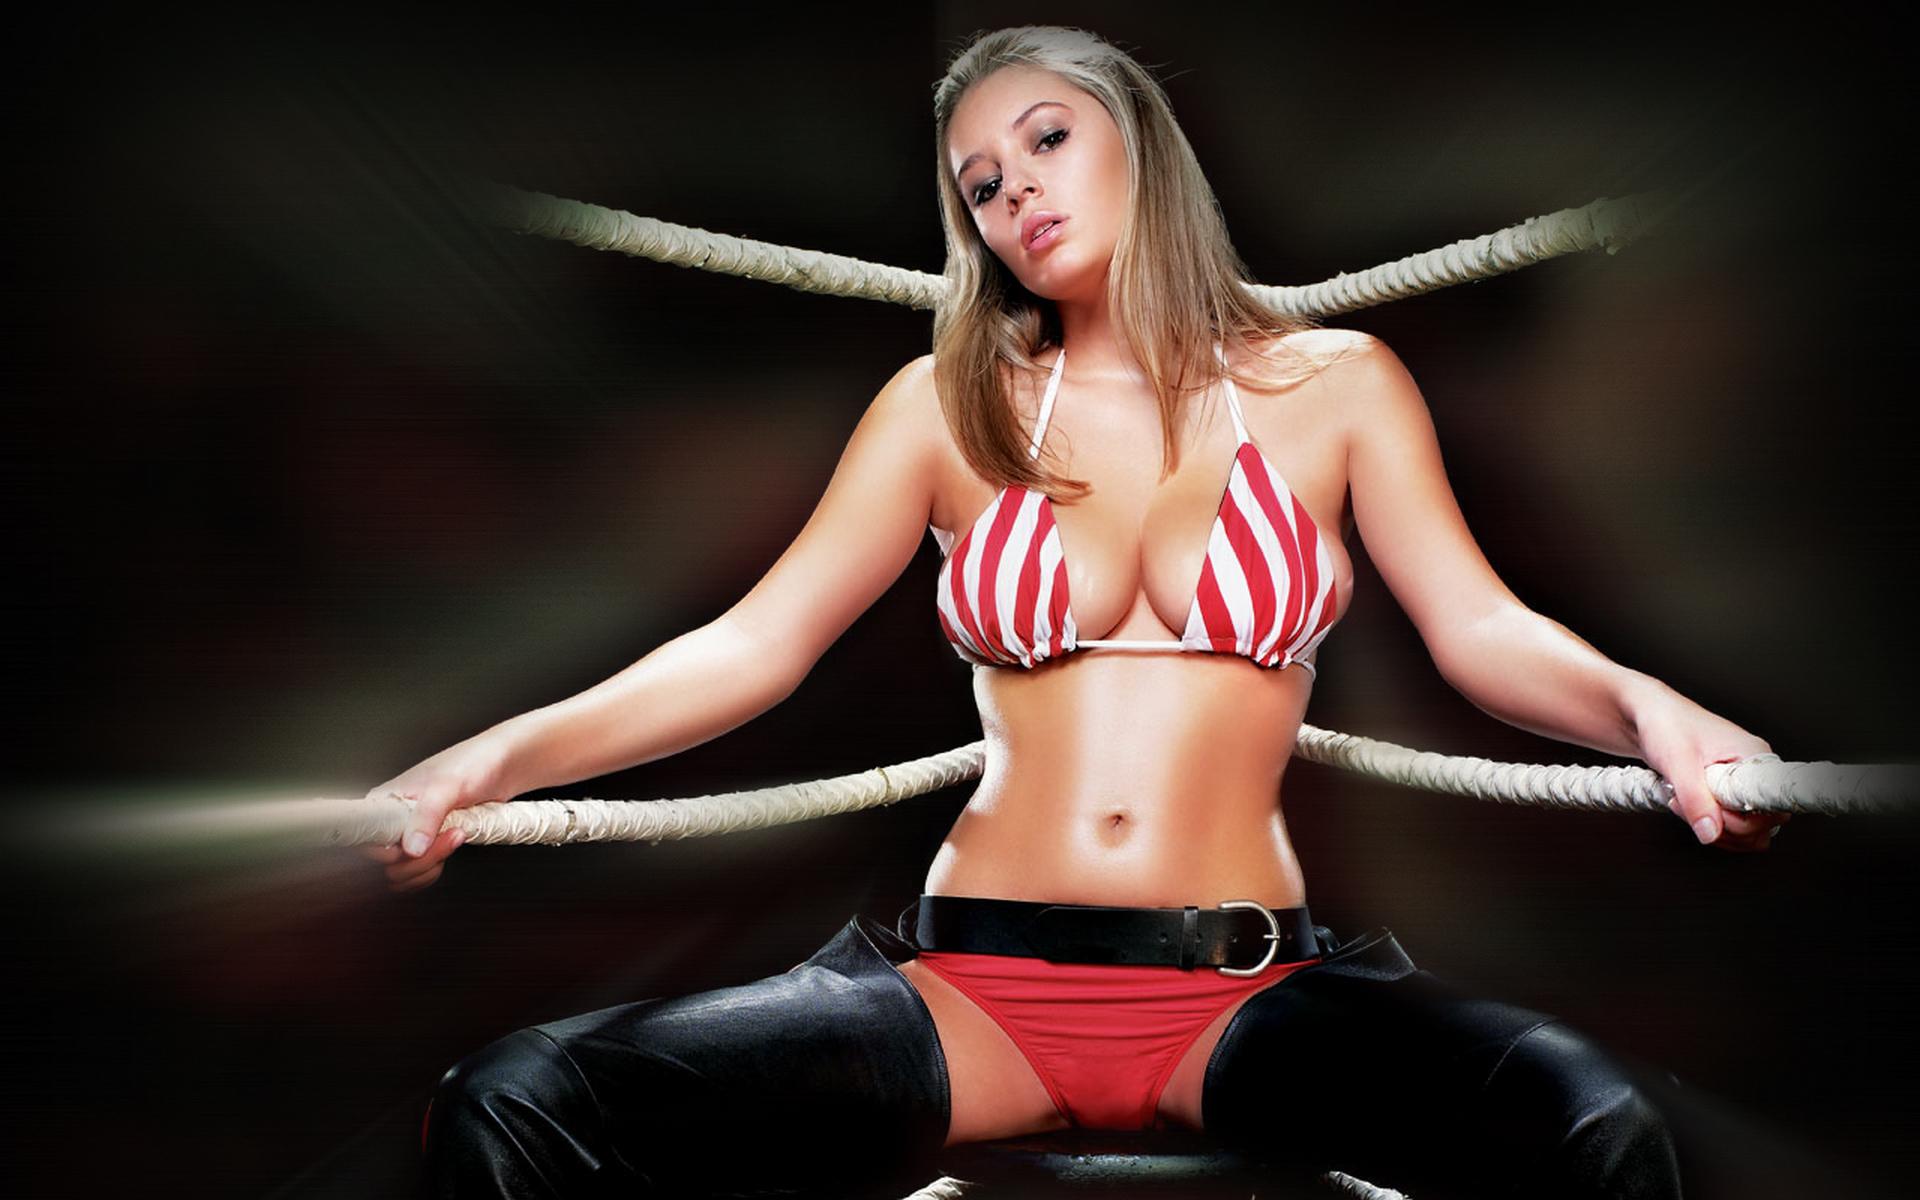 Секси девушка бокс 8 фотография